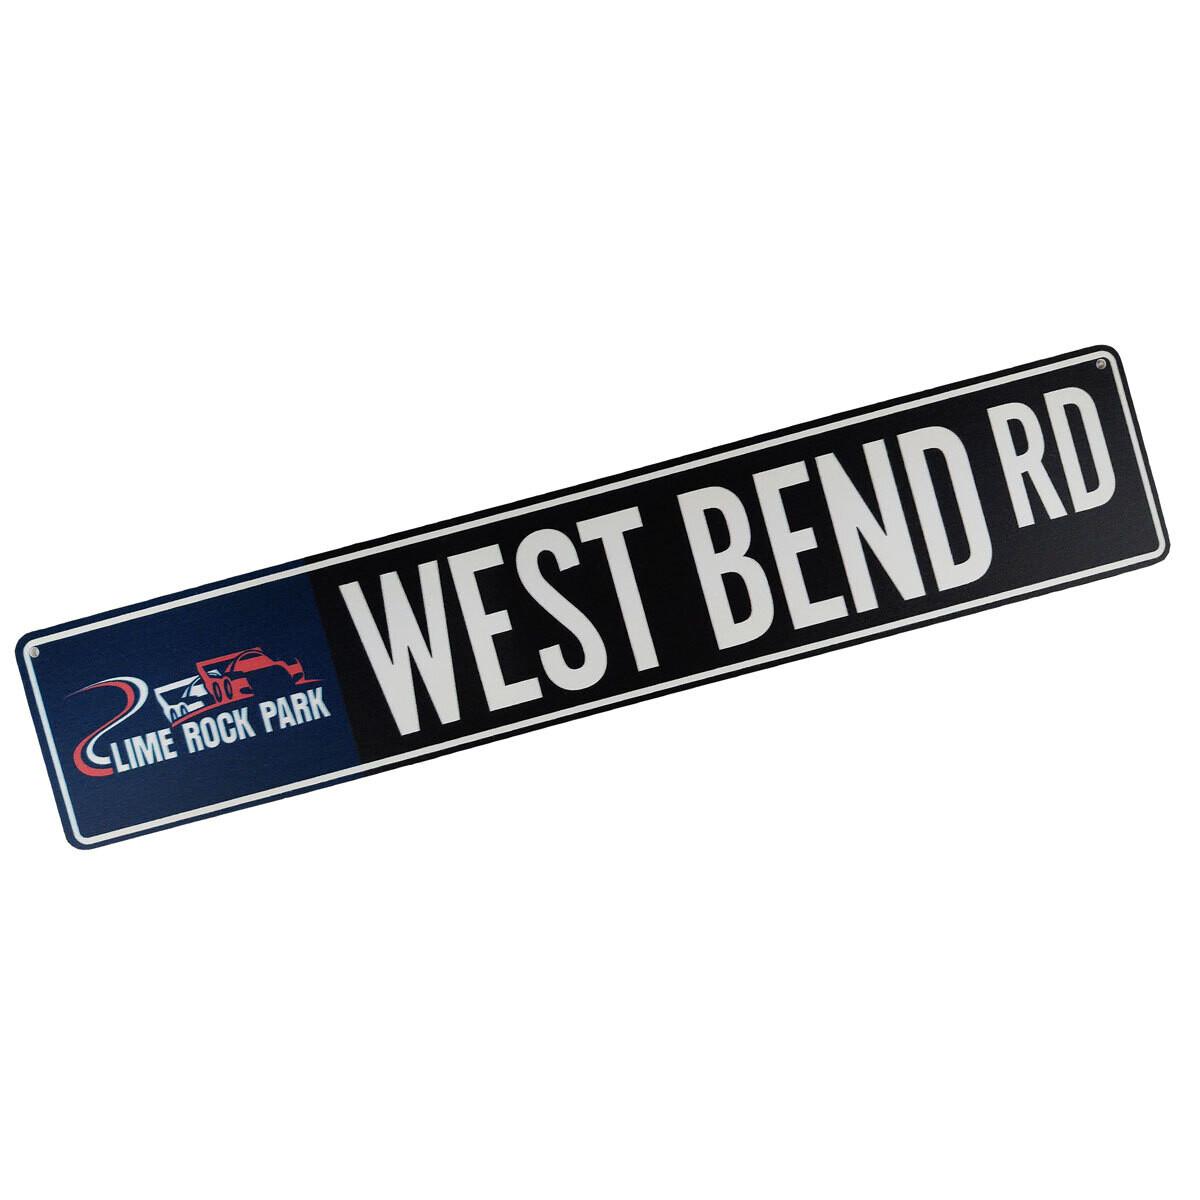 Street Sign - West Bend